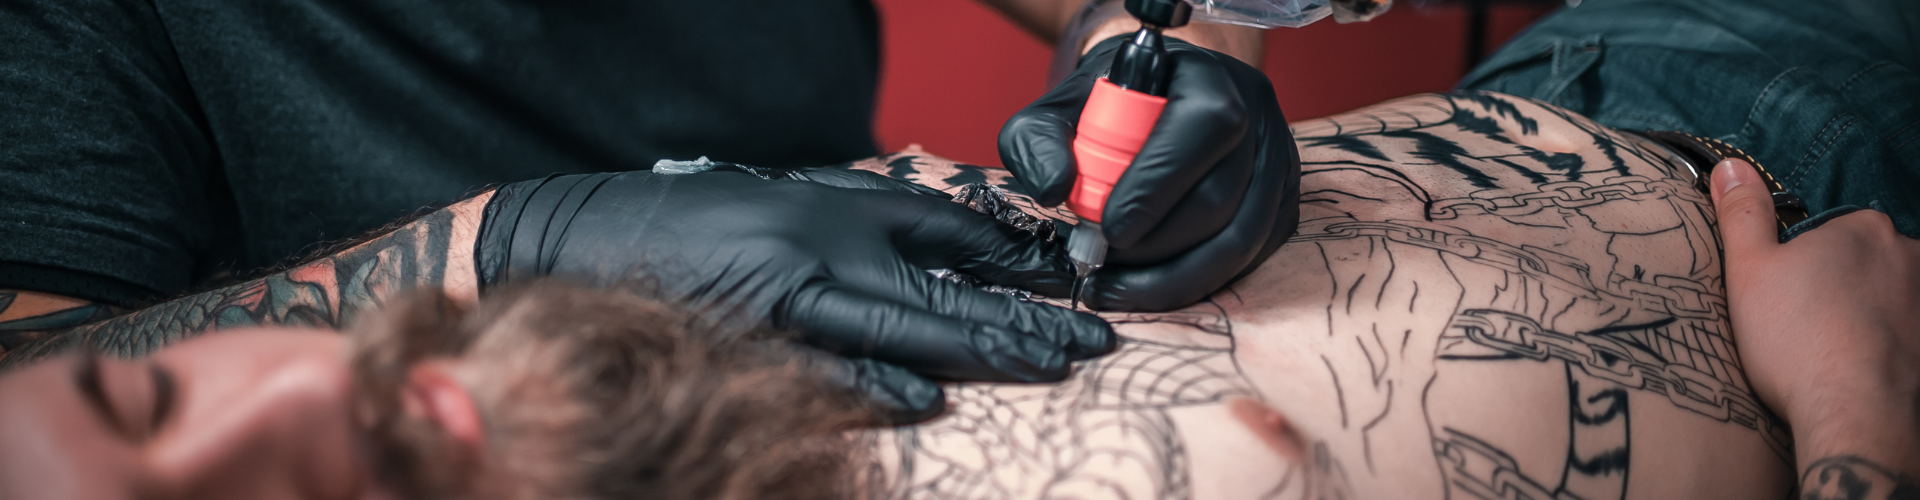 socialbeardsnl tattooshop marketing